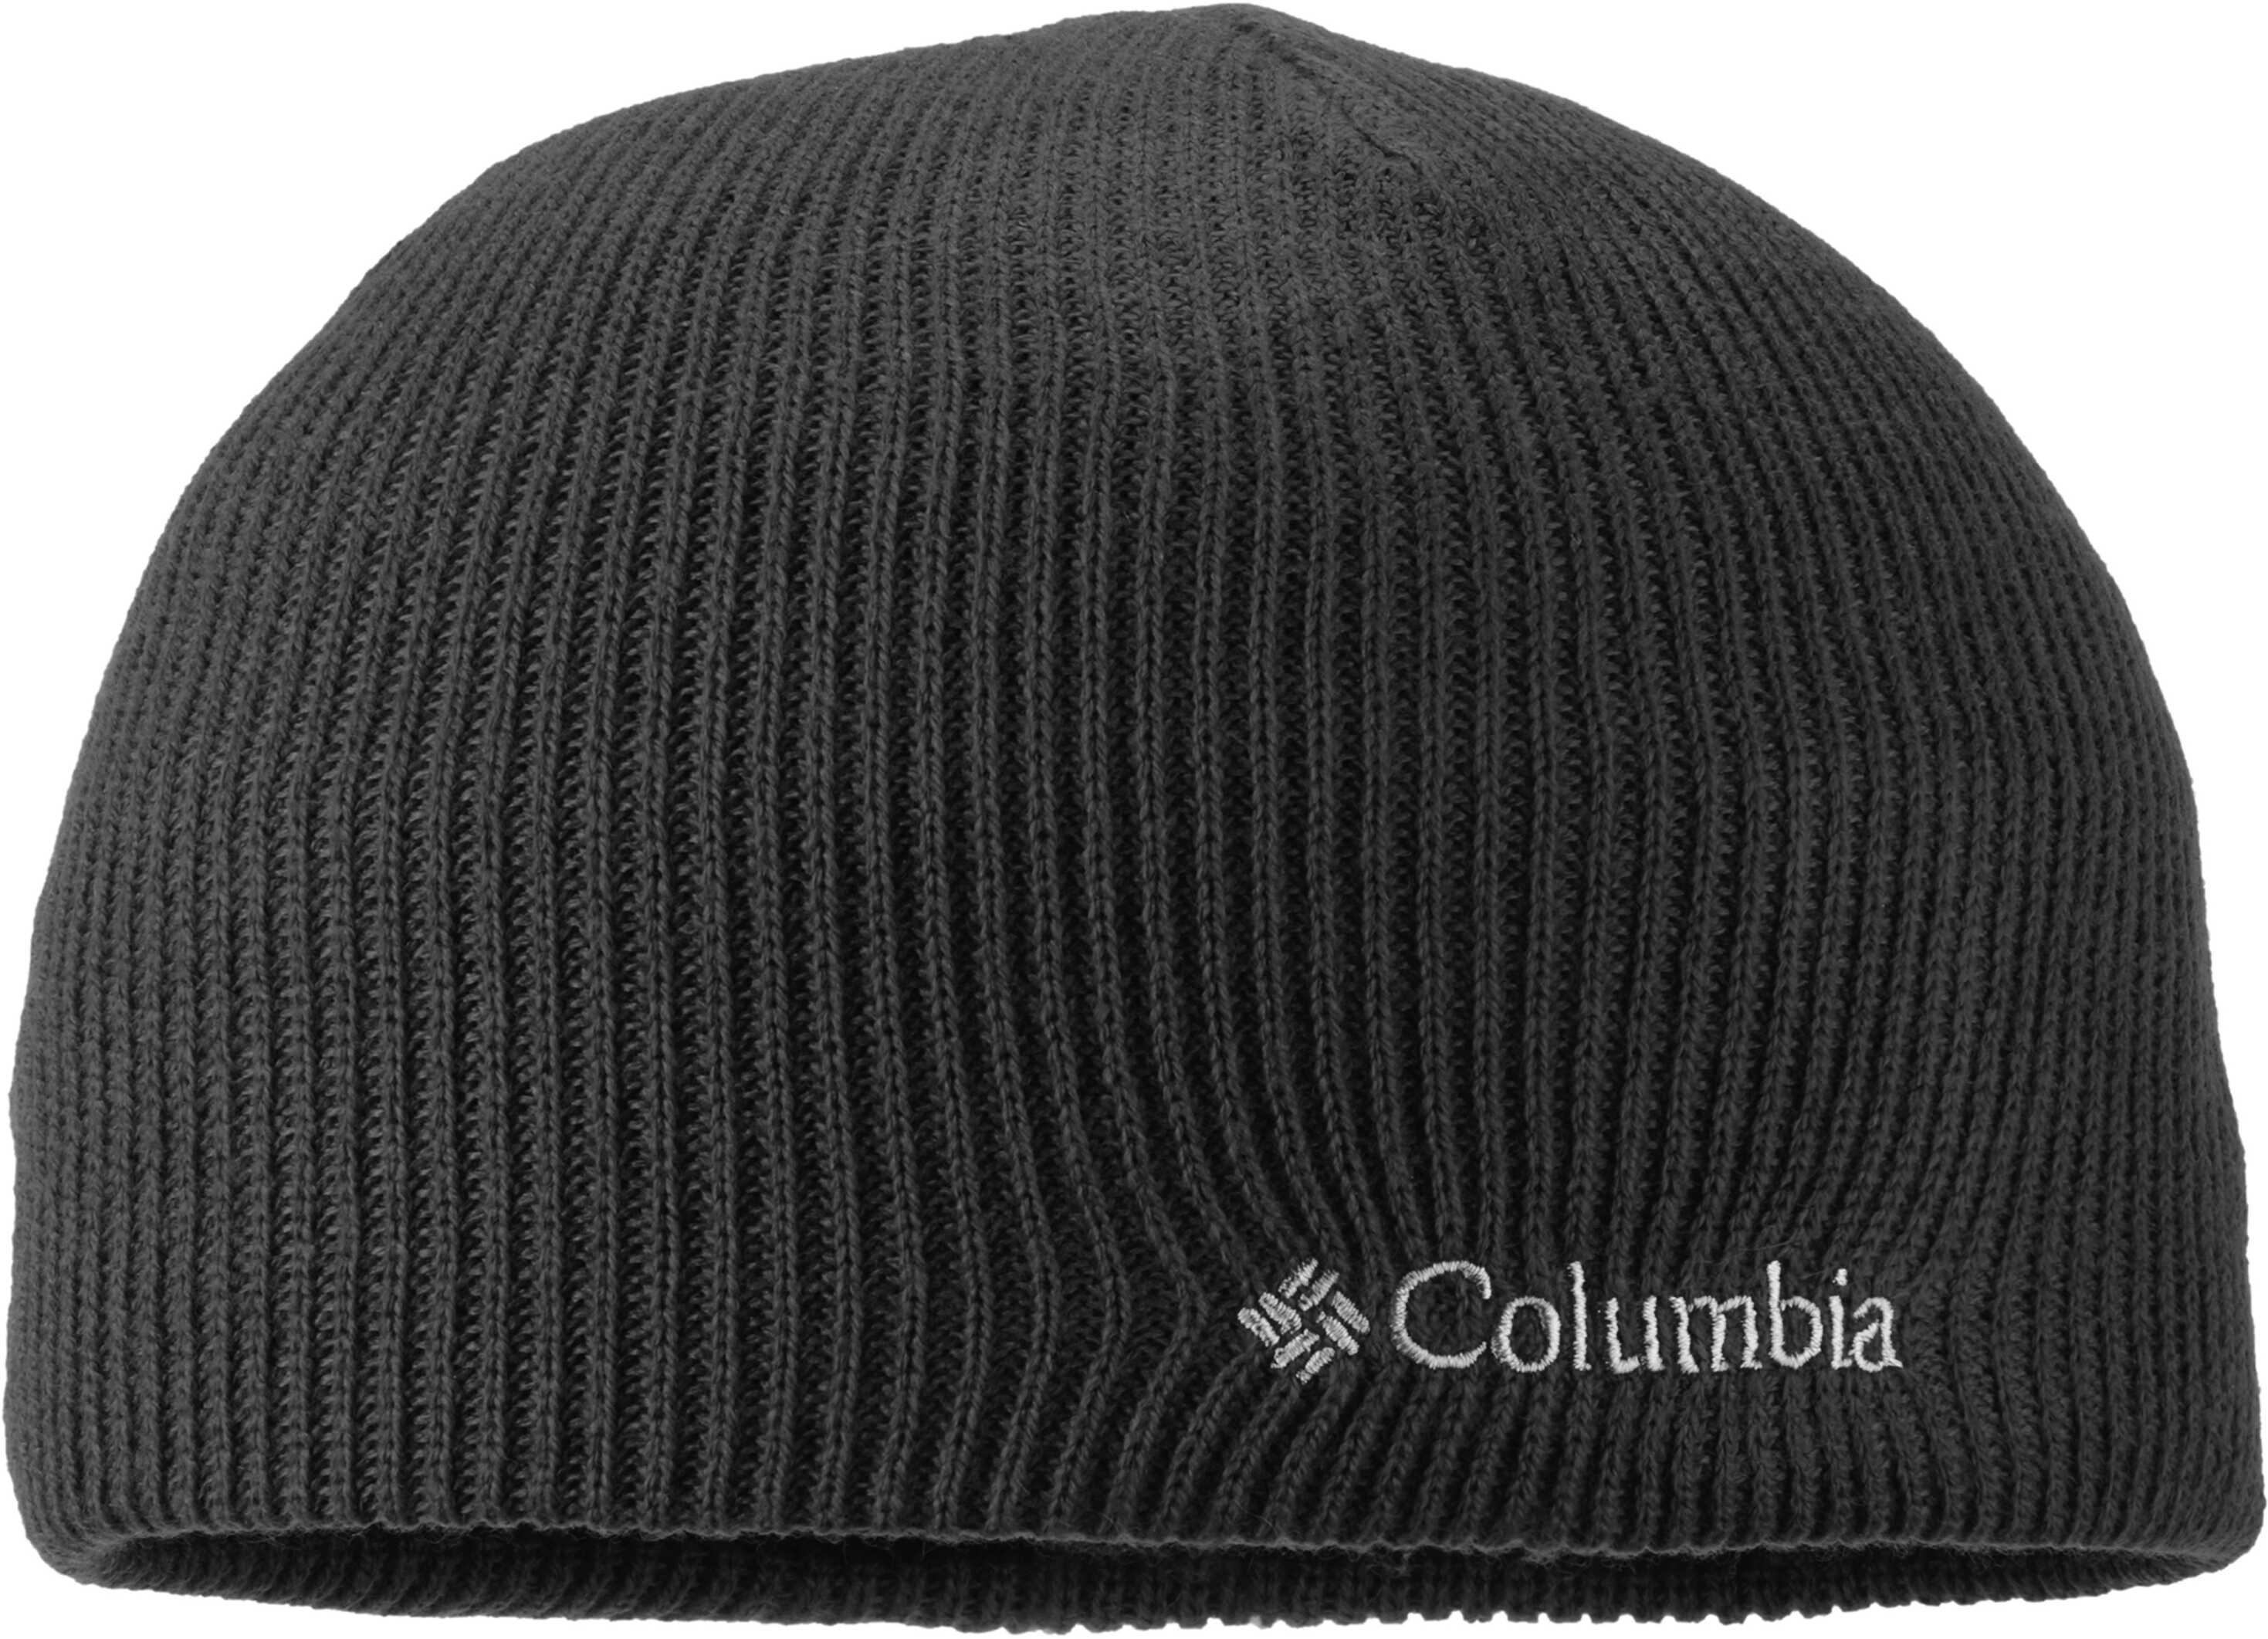 Columbia Whirlibird Watch Cap Beanie-Black,Black Black,Black